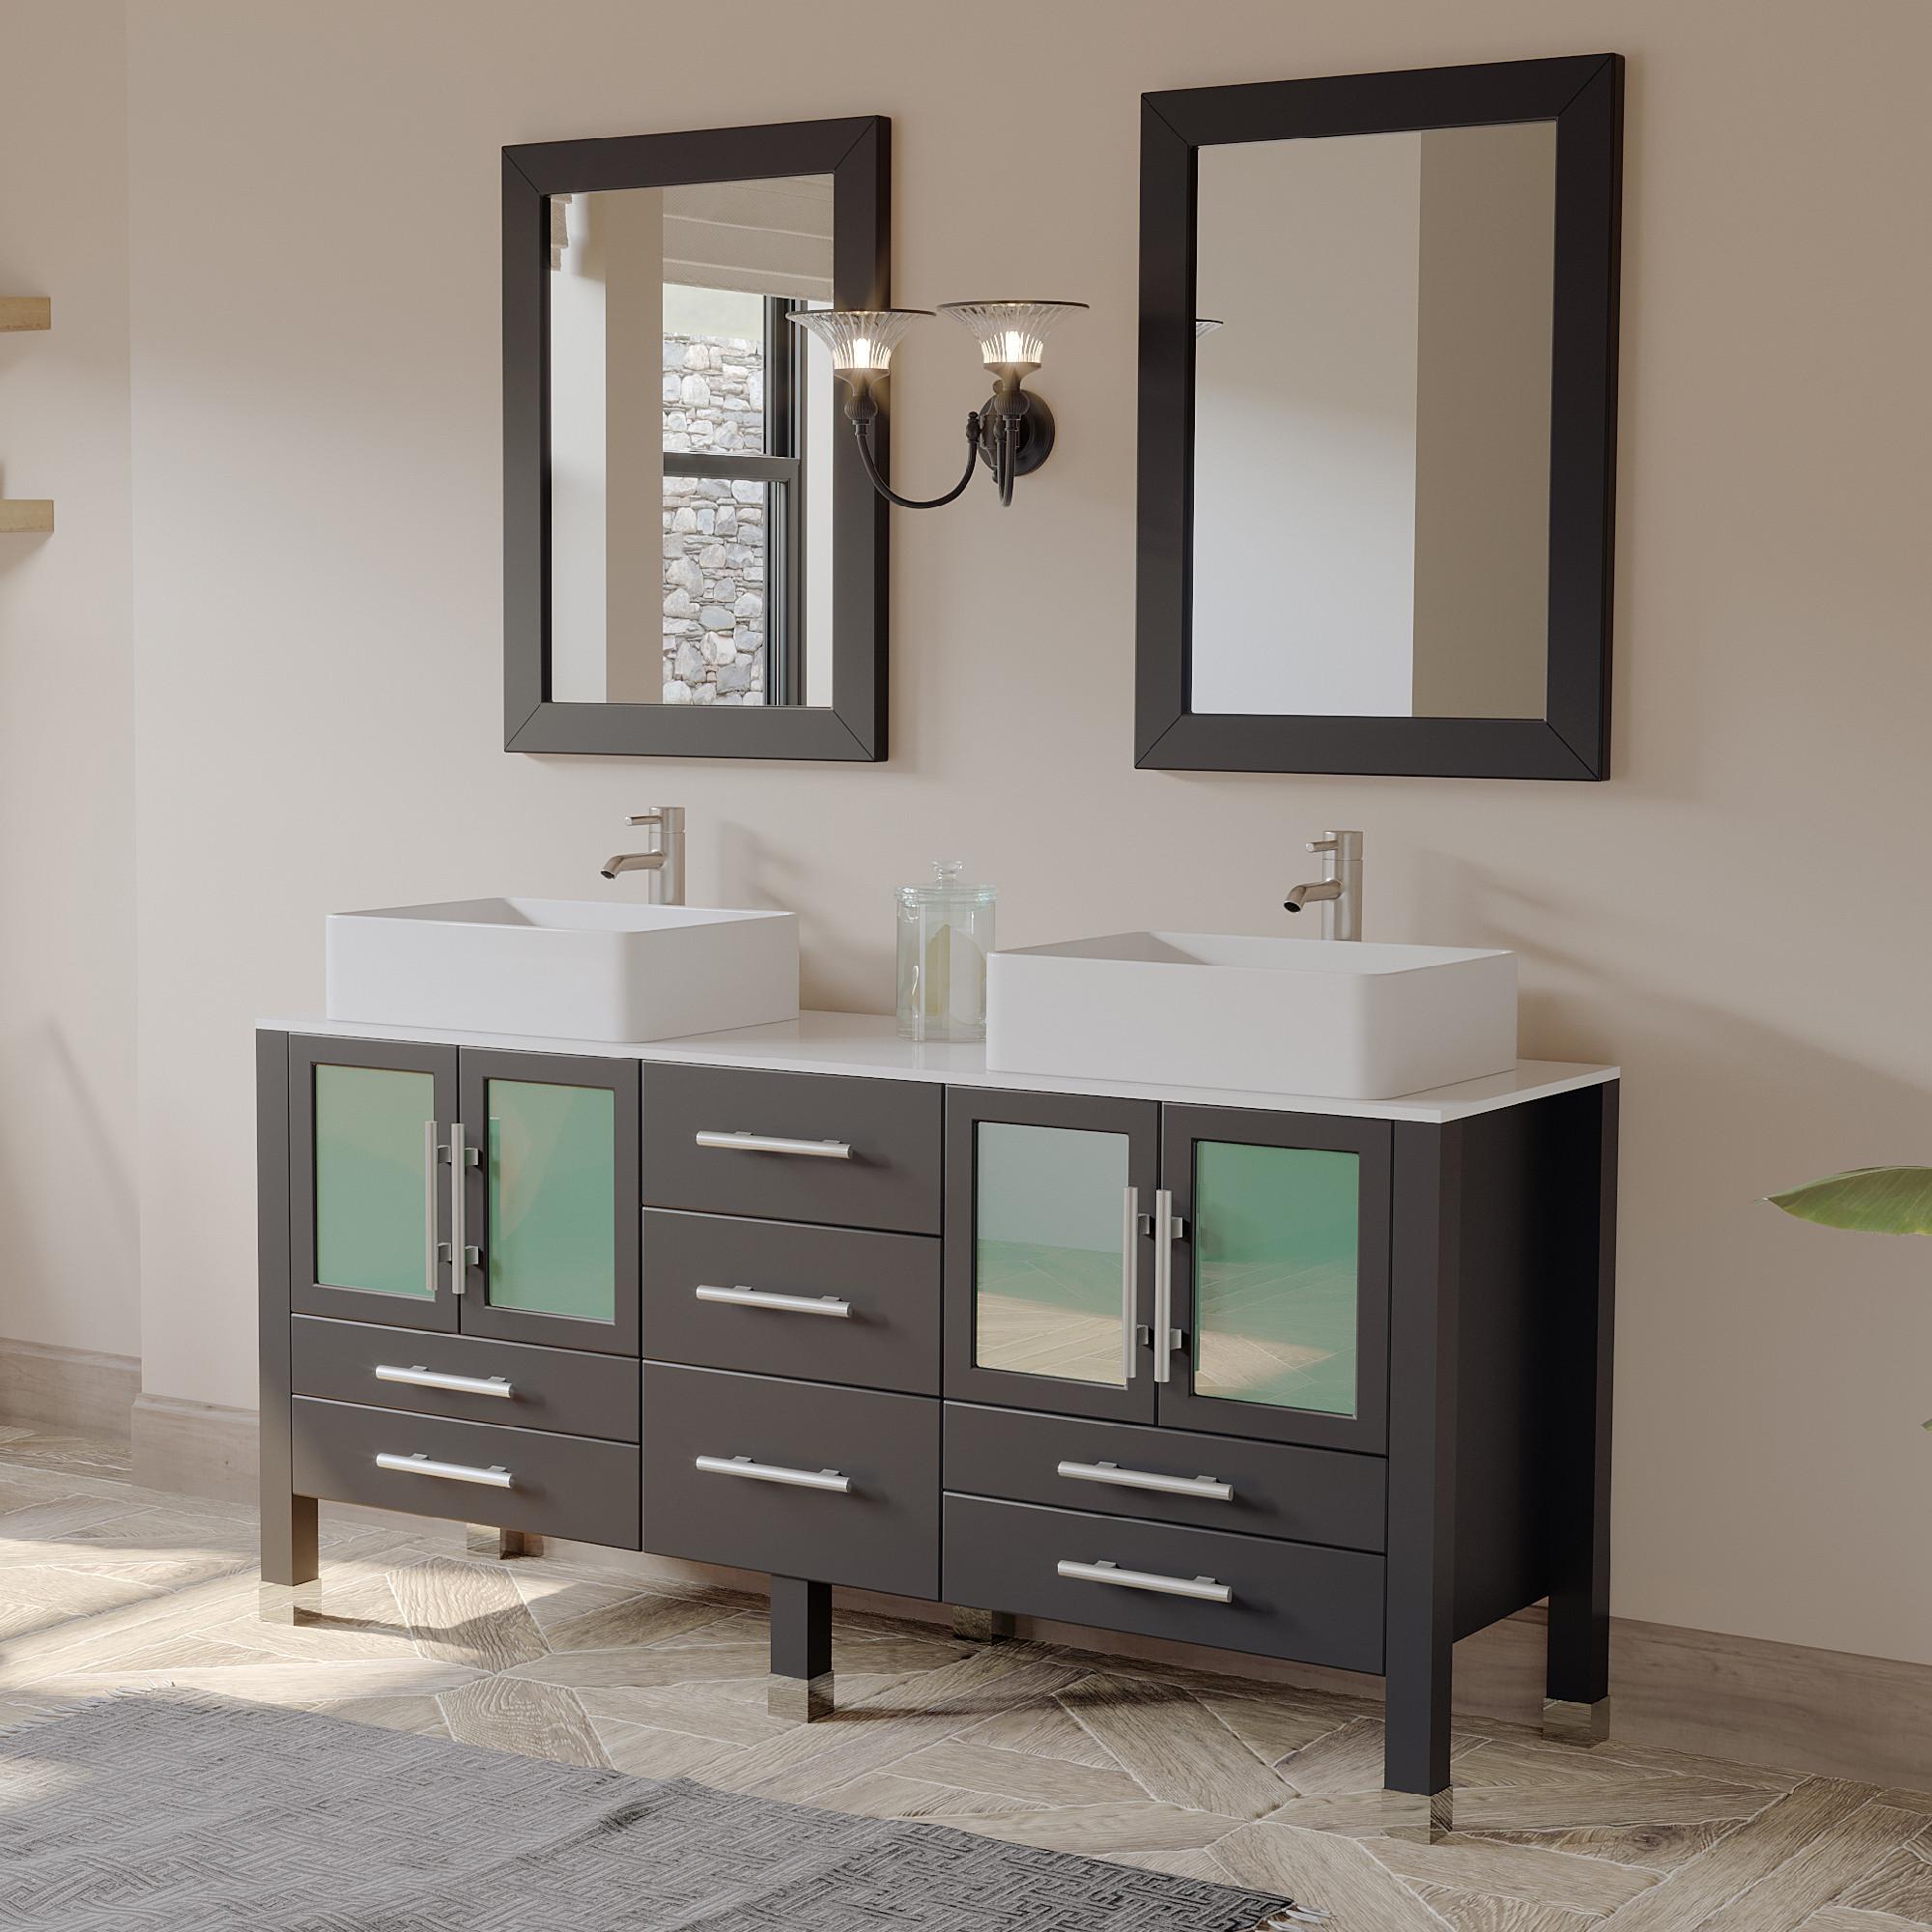 Cambridge 8119-BN 63 Inch Espresso Wood Vanity Set With Two Vessel Sinks